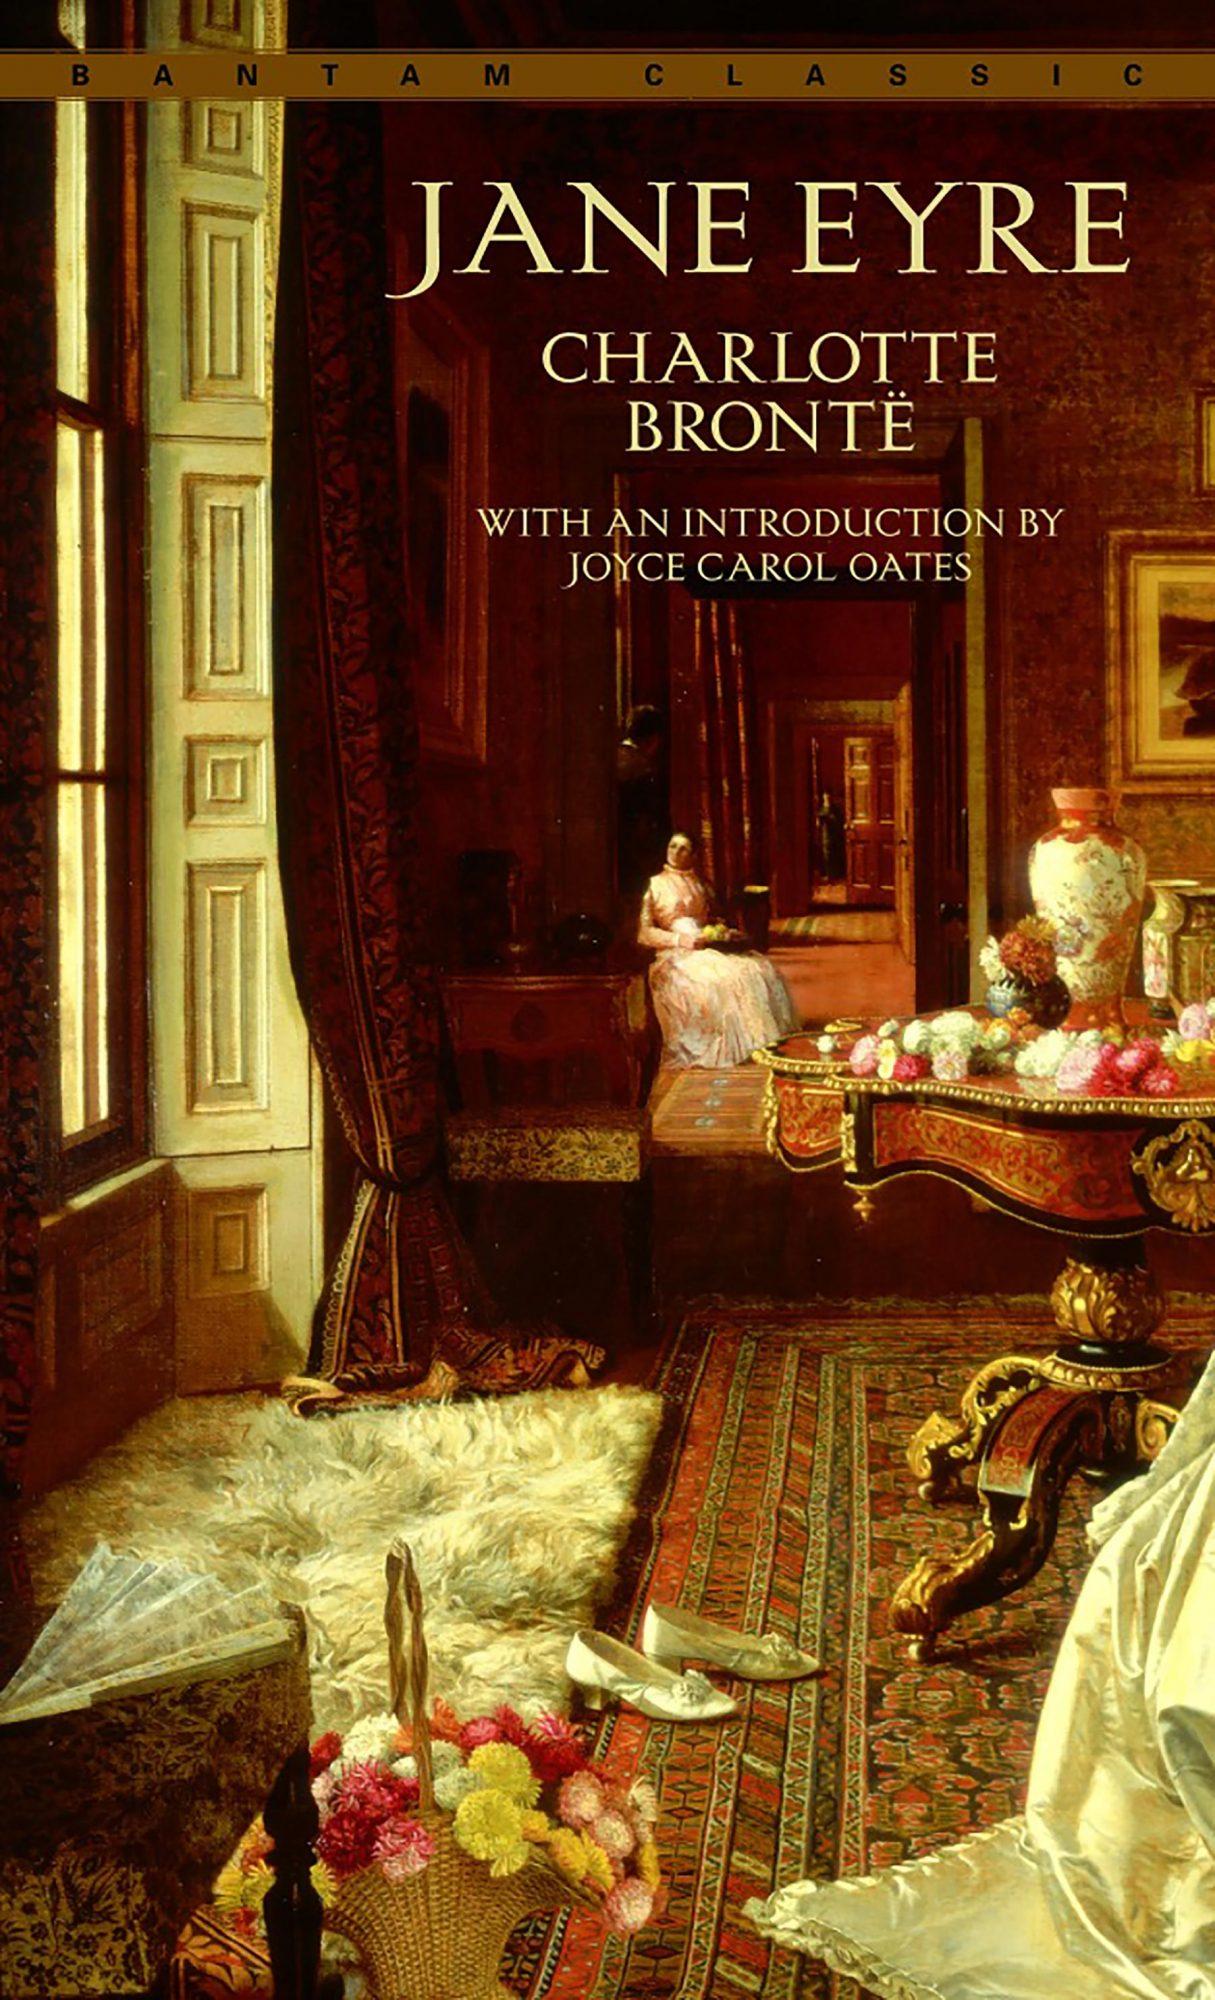 Jane Eyre - Paperback (9/01/1983æ)by Charlotte Bronte